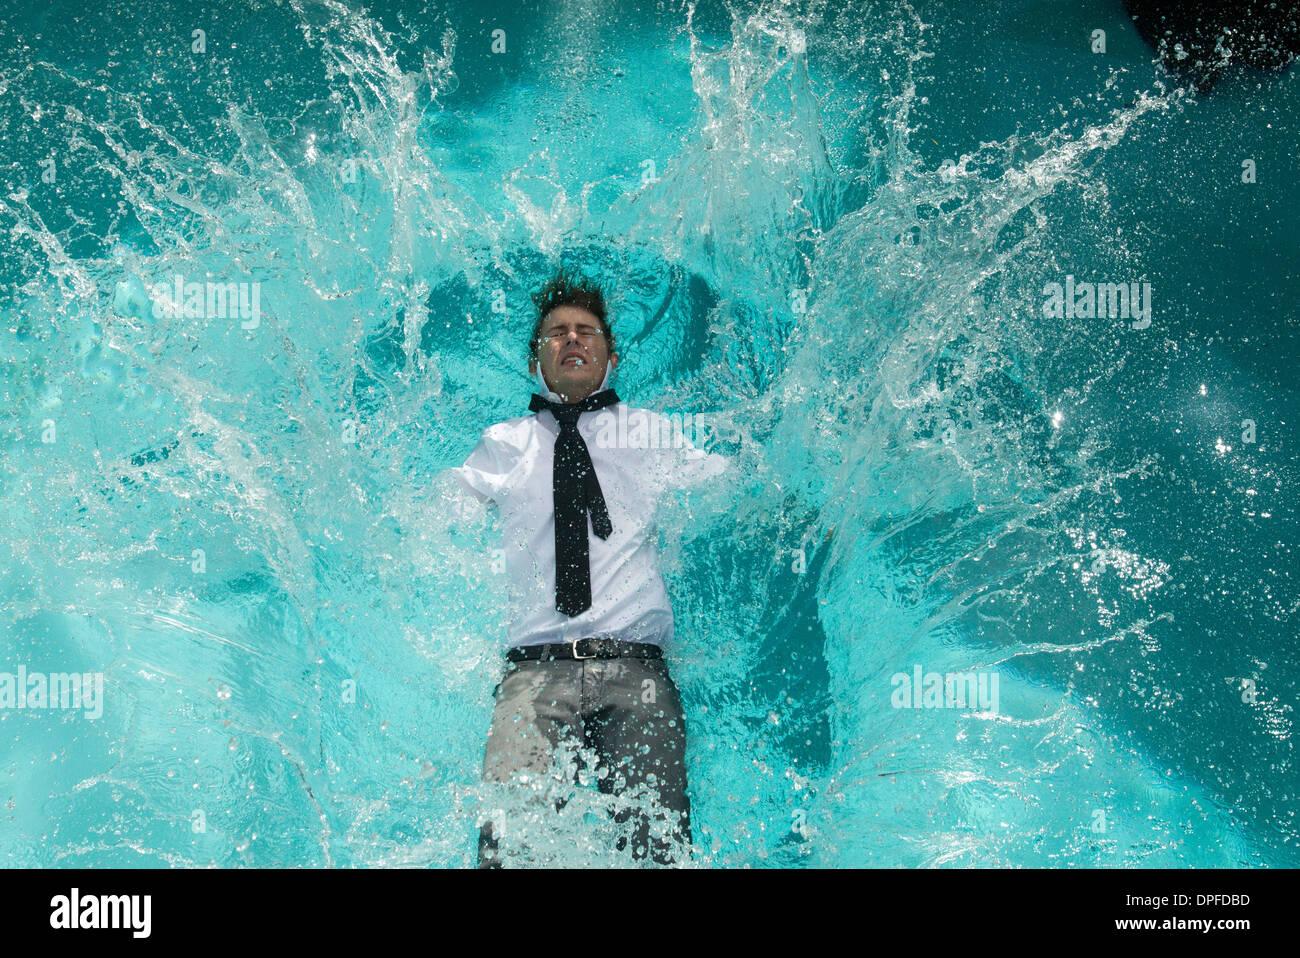 Junger Mann in der Kleidung ins Schwimmbad fallen Stockbild